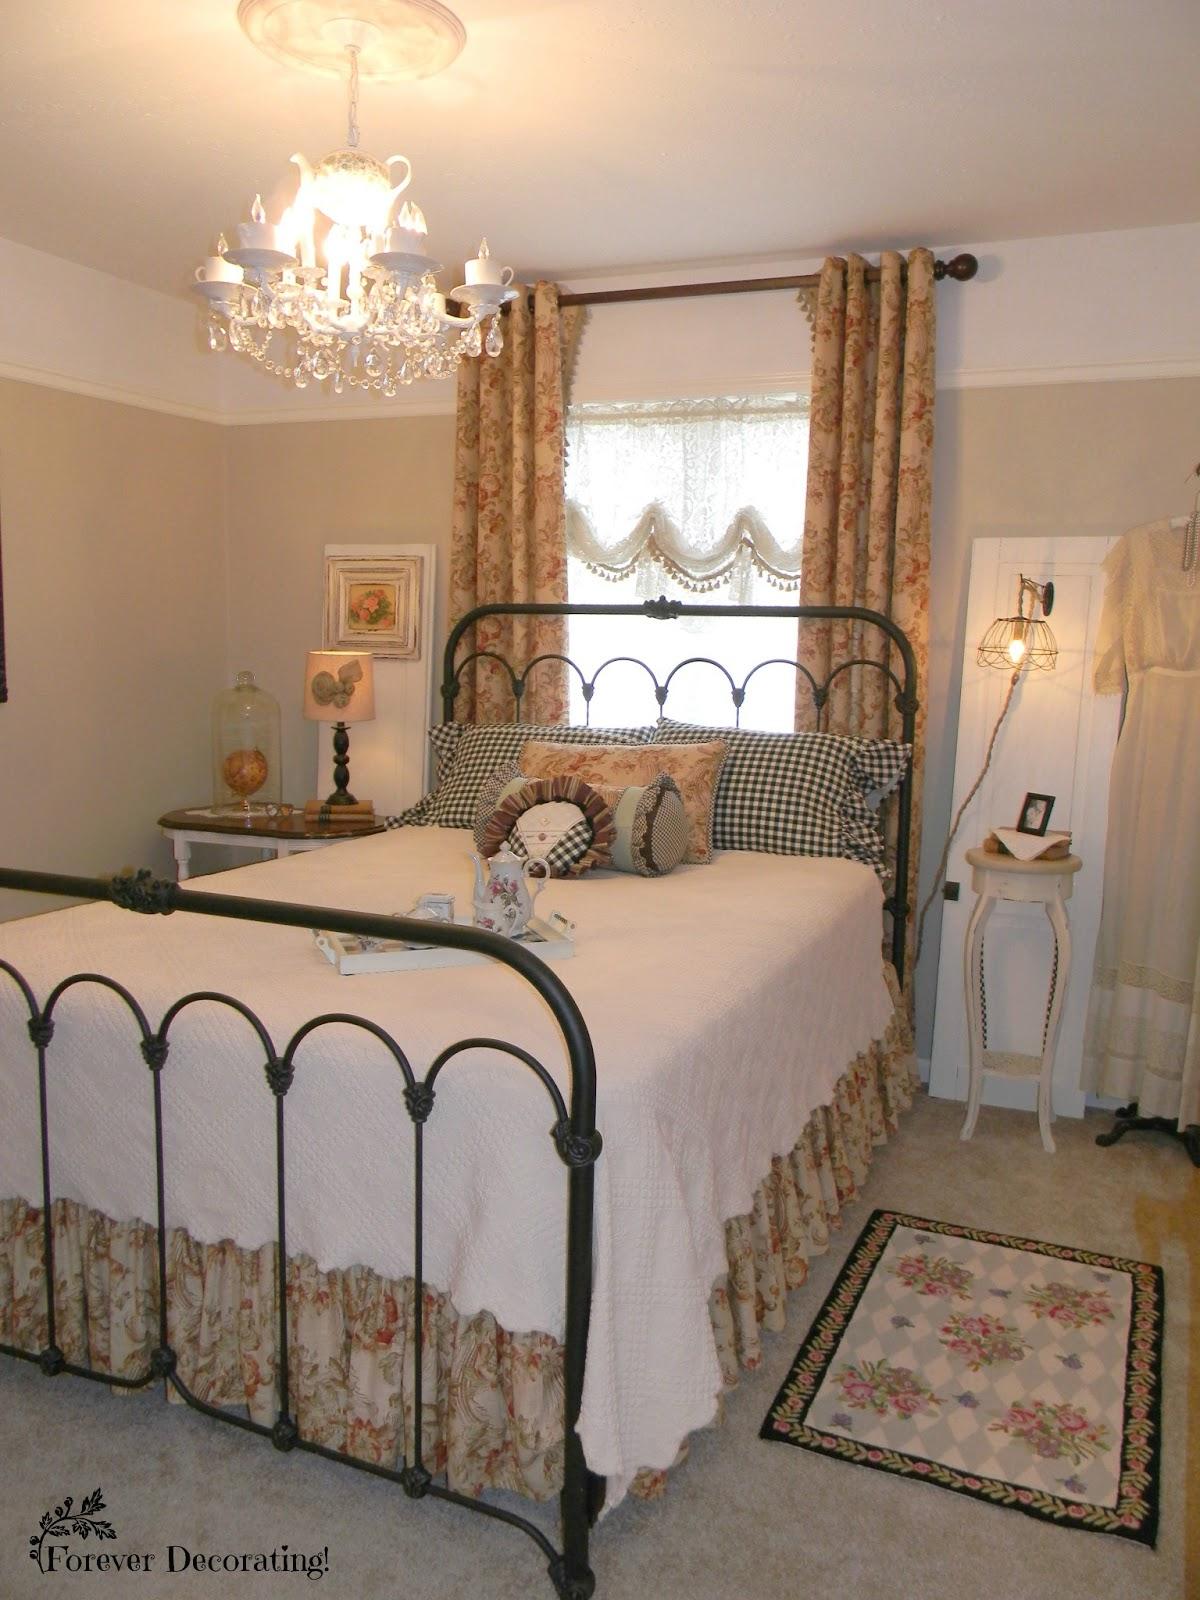 Forever Decorating!: Guest Bedroom Reveal ~ MacKenzie ...